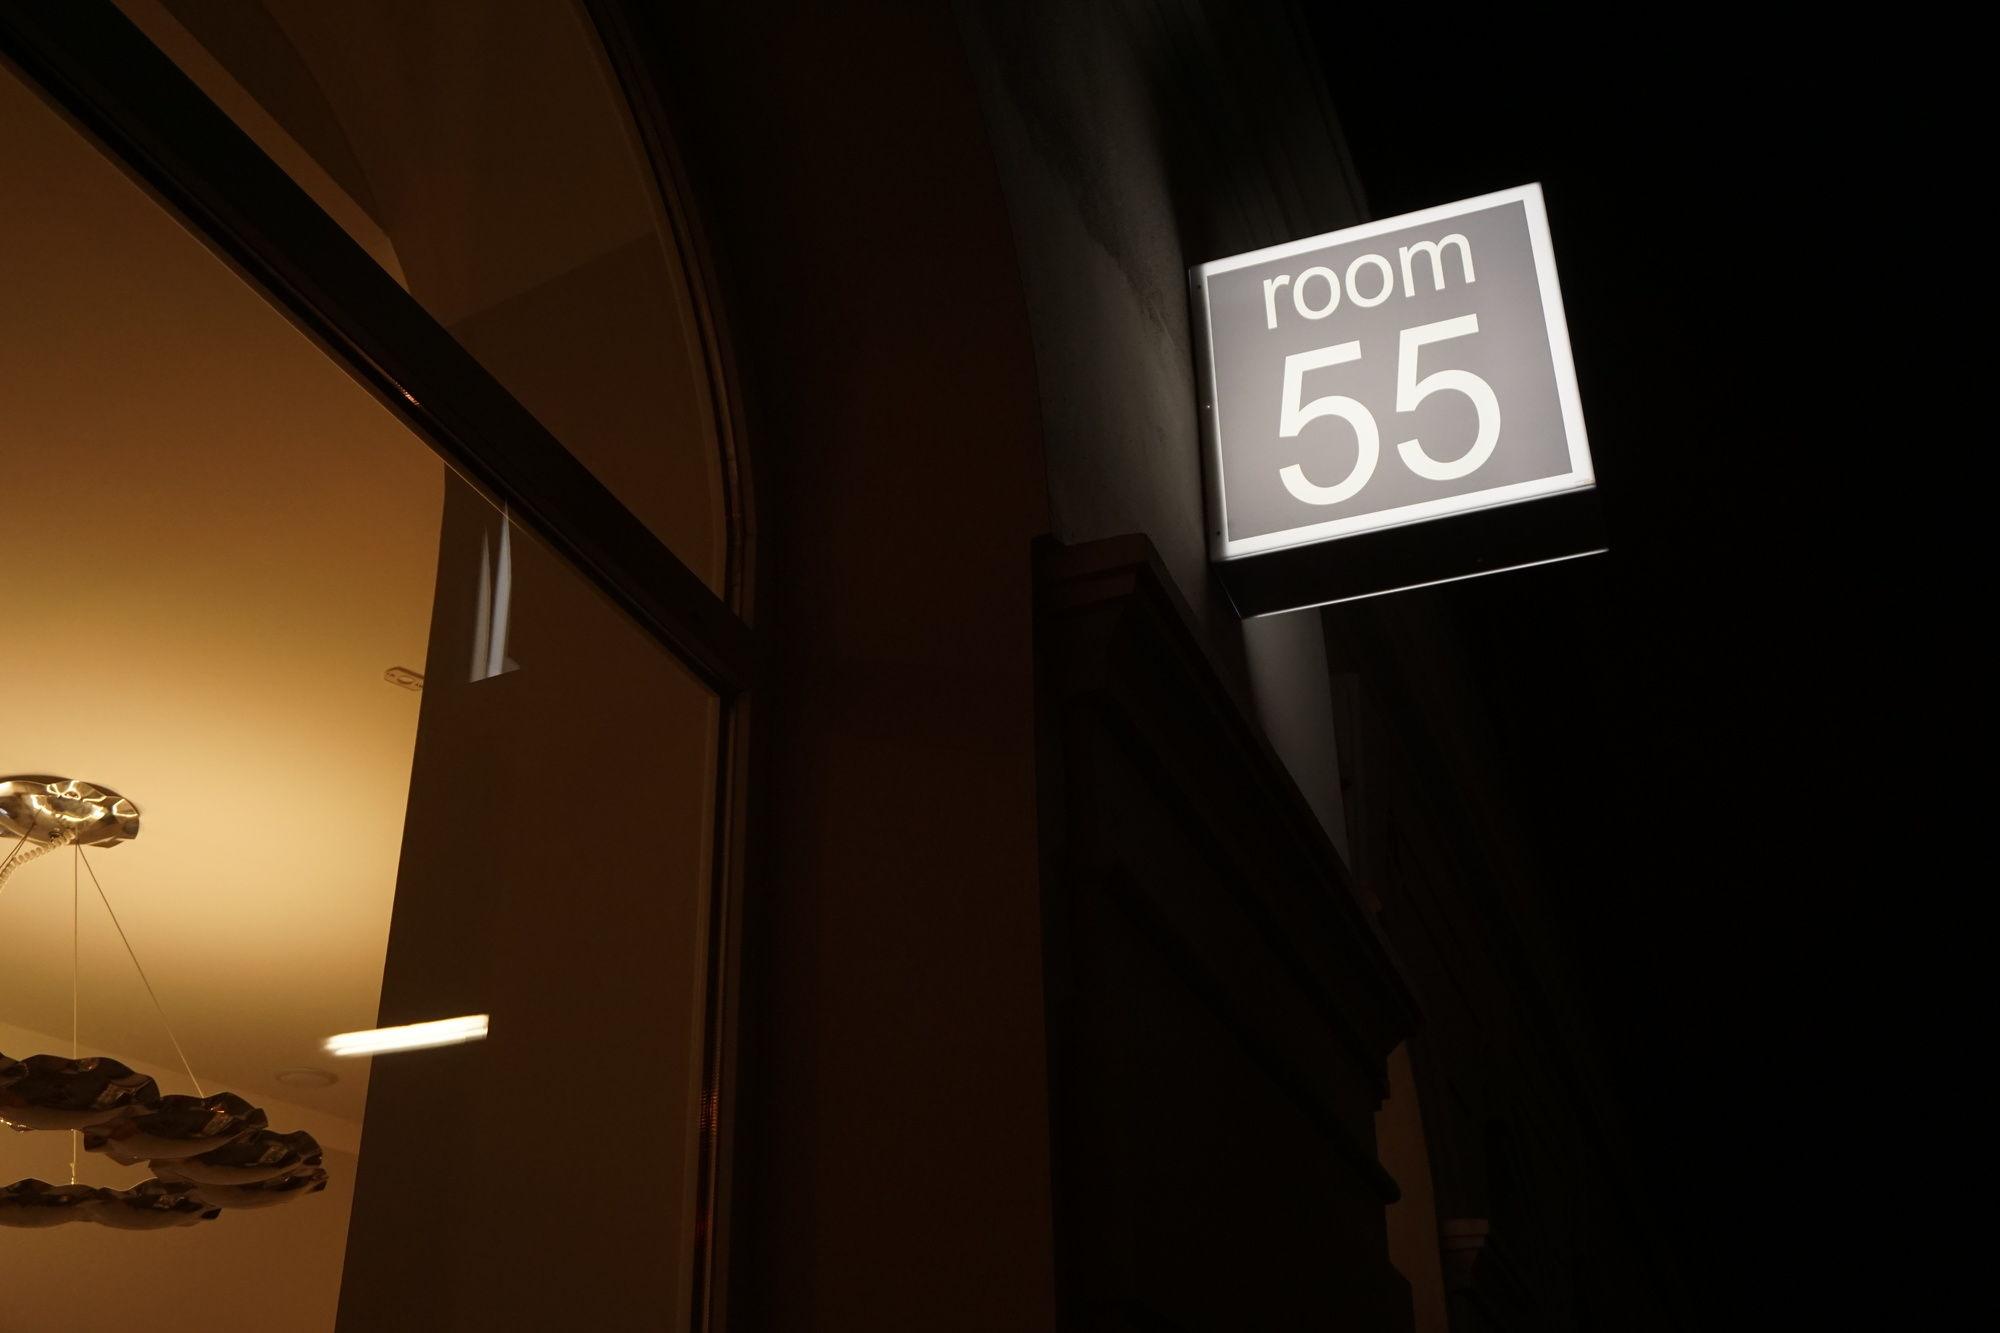 Room 55 (روم ۵۵)